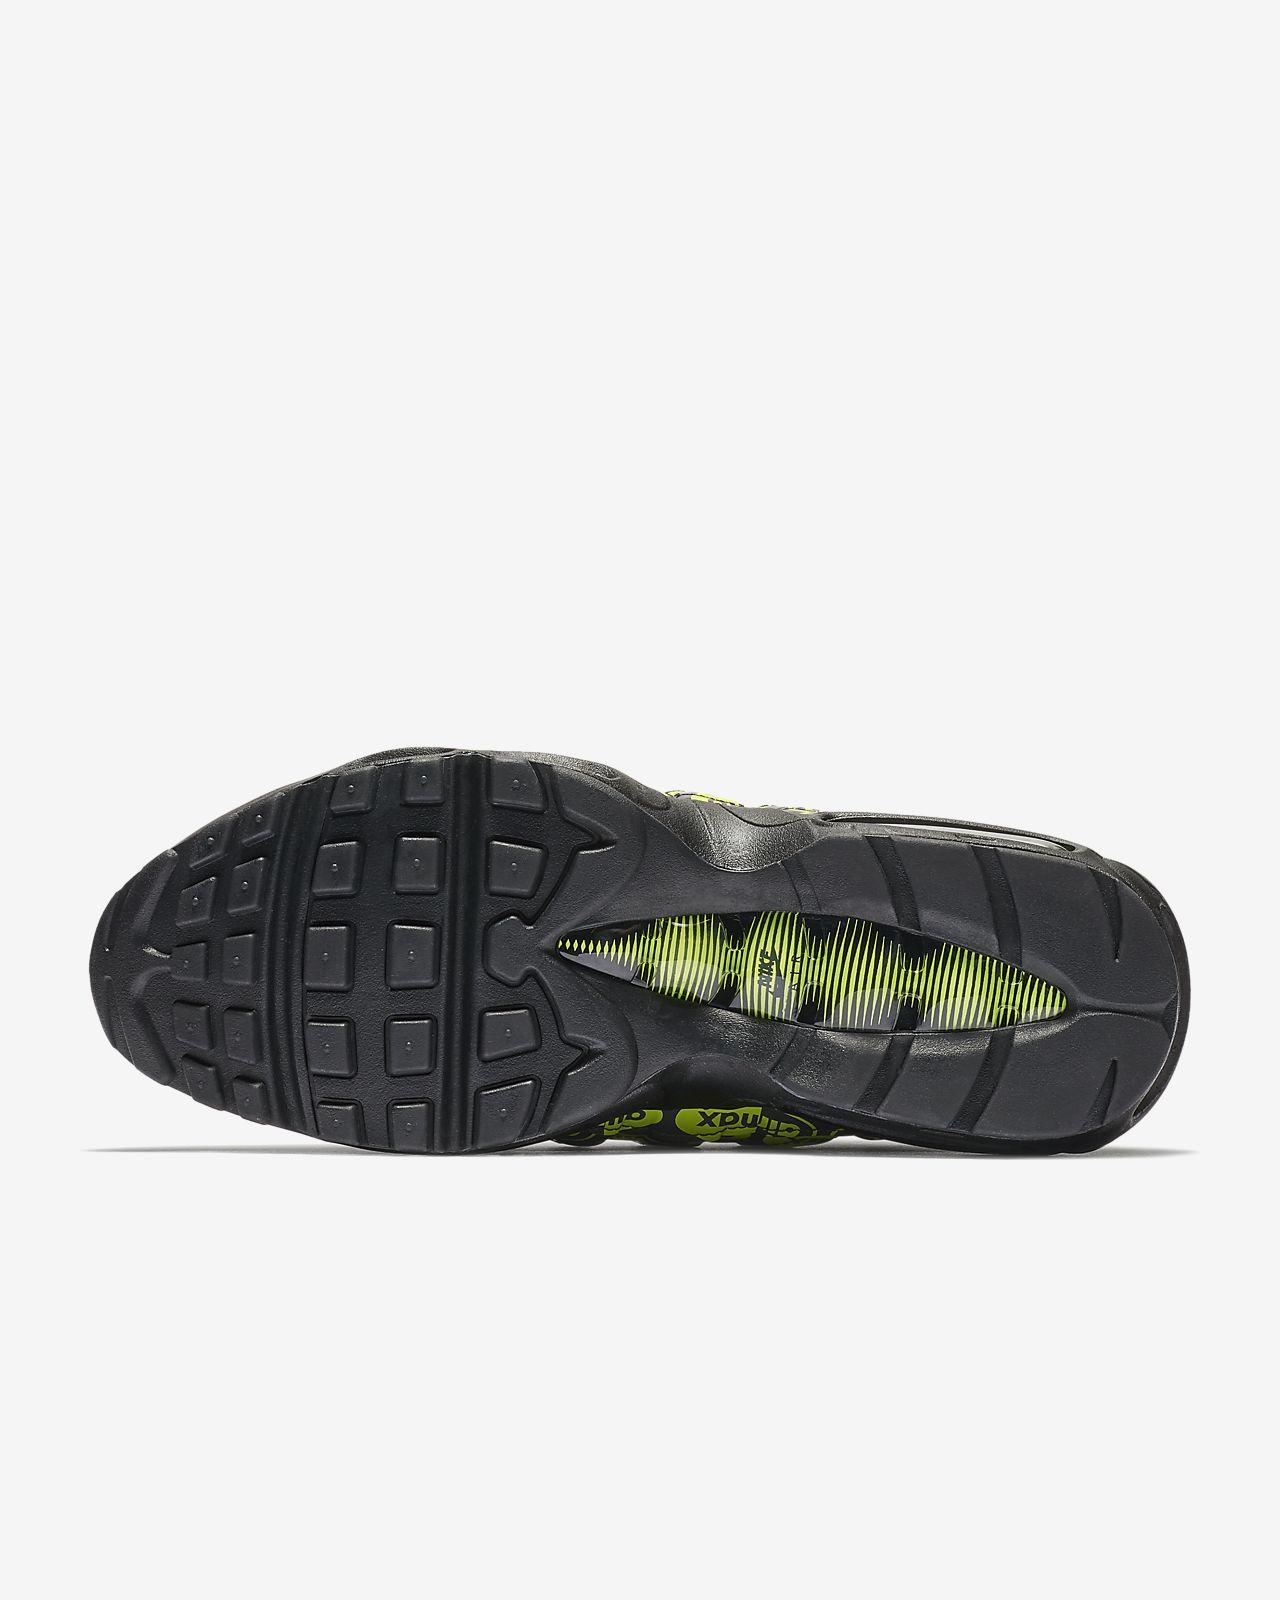 best service 43dac a46cf ... Nike Air Max 95 Premium Mens Shoe